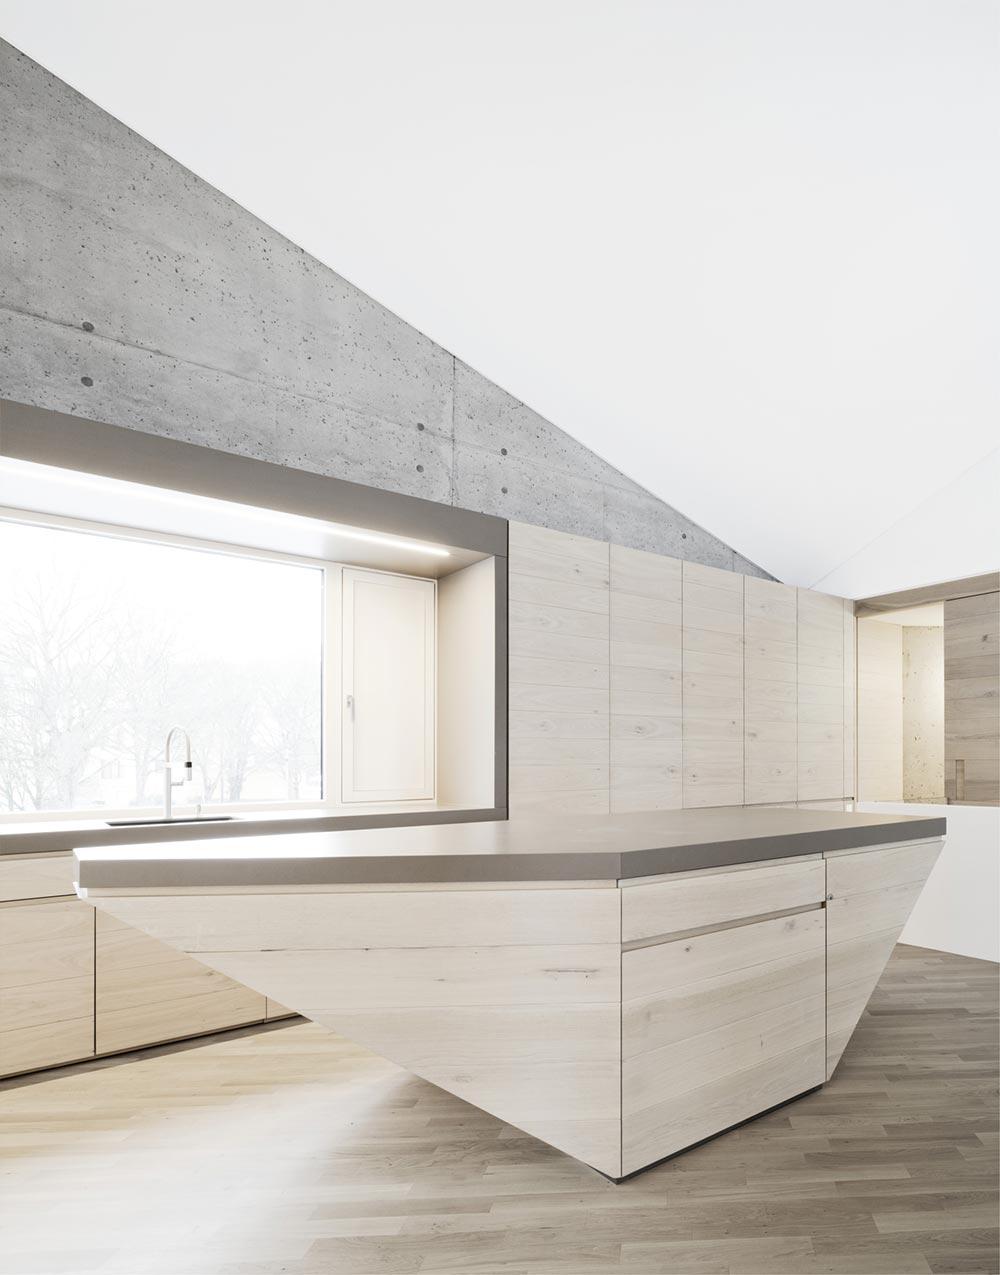 Concrete house kitchen island design